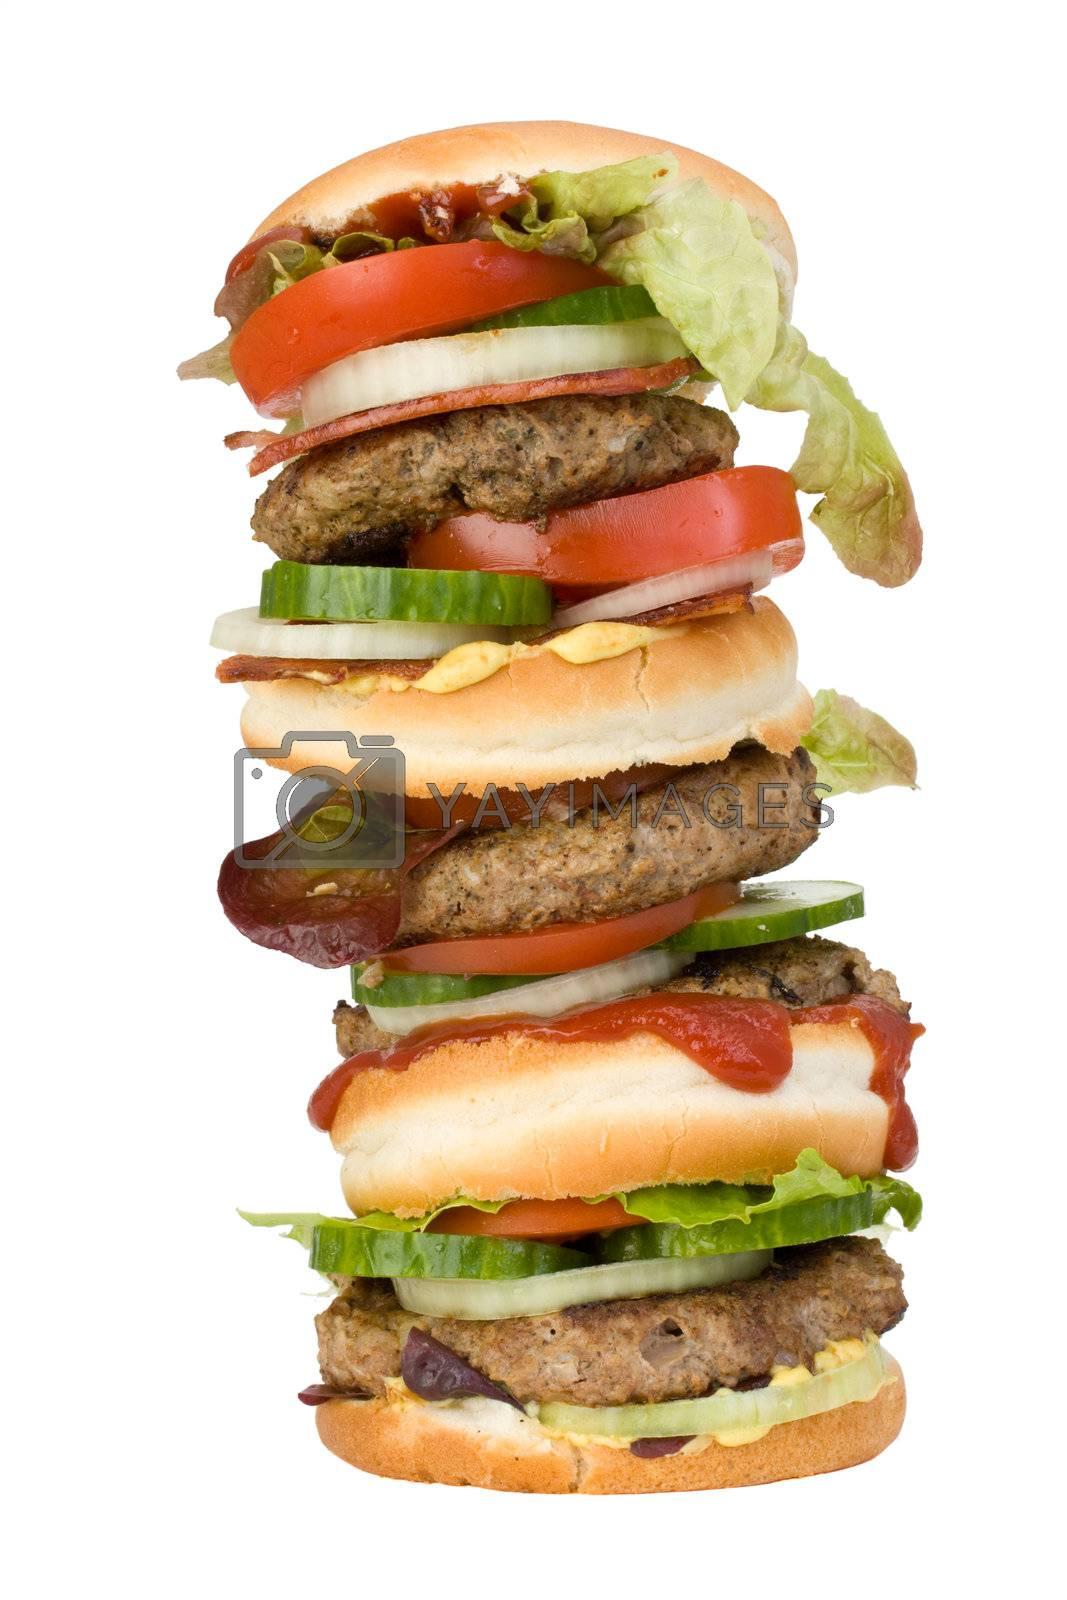 a home made quadruple hamburger isolated on white background